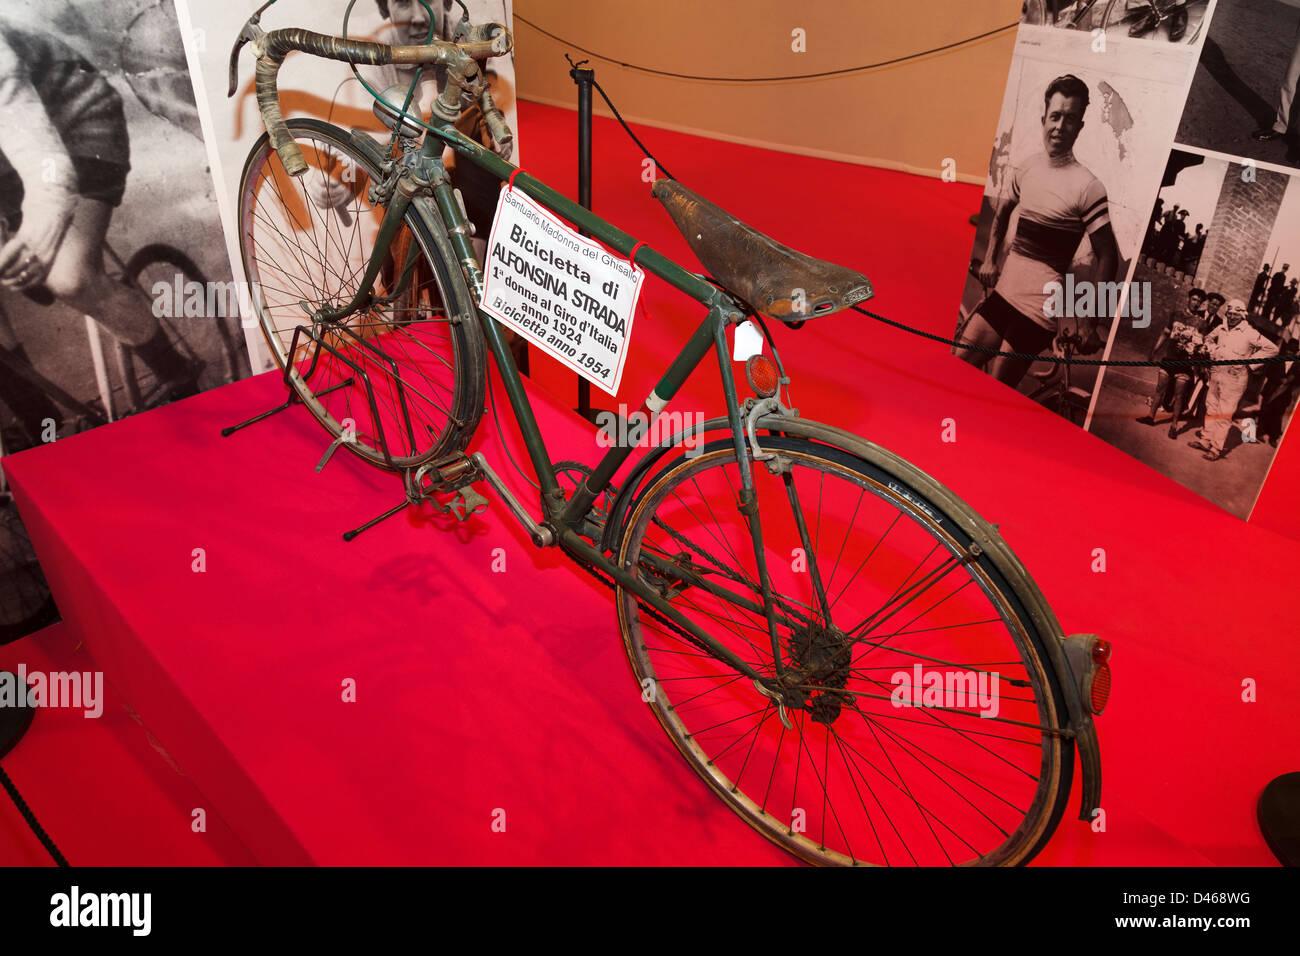 Alfonsina Strada bicicleta del Giro d'Italia, año 1924 Imagen De Stock